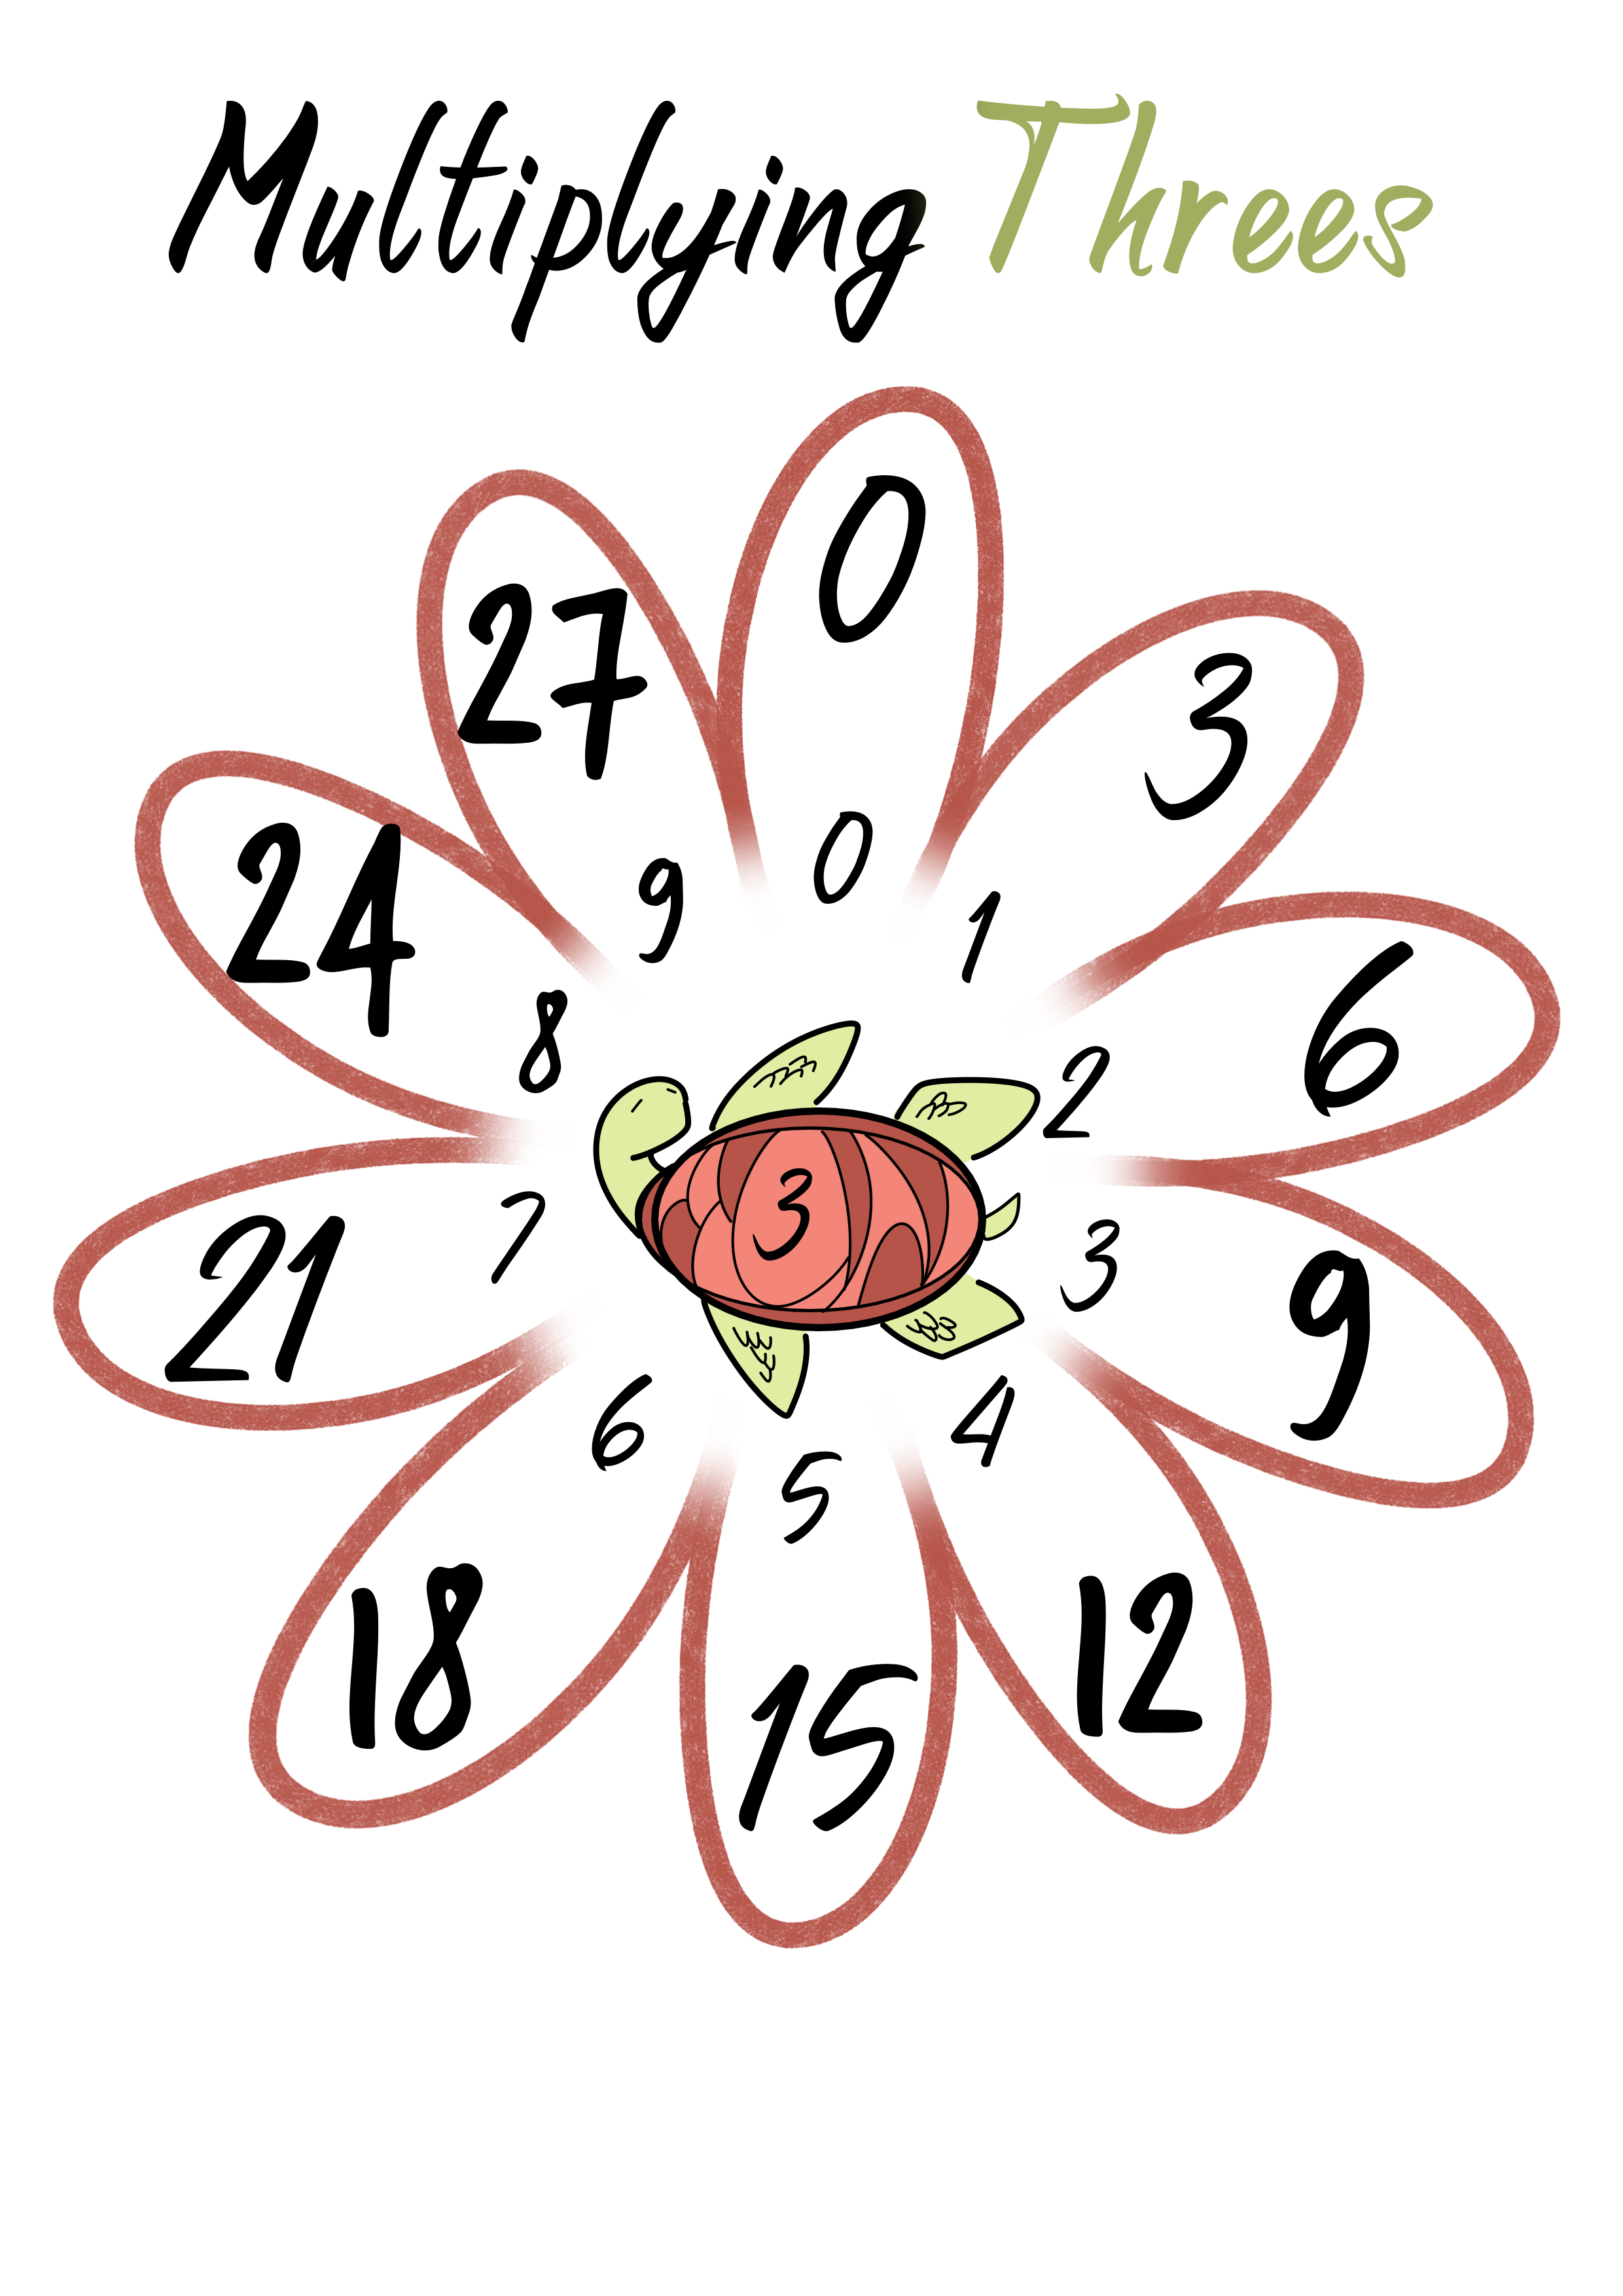 Multiplying Threes